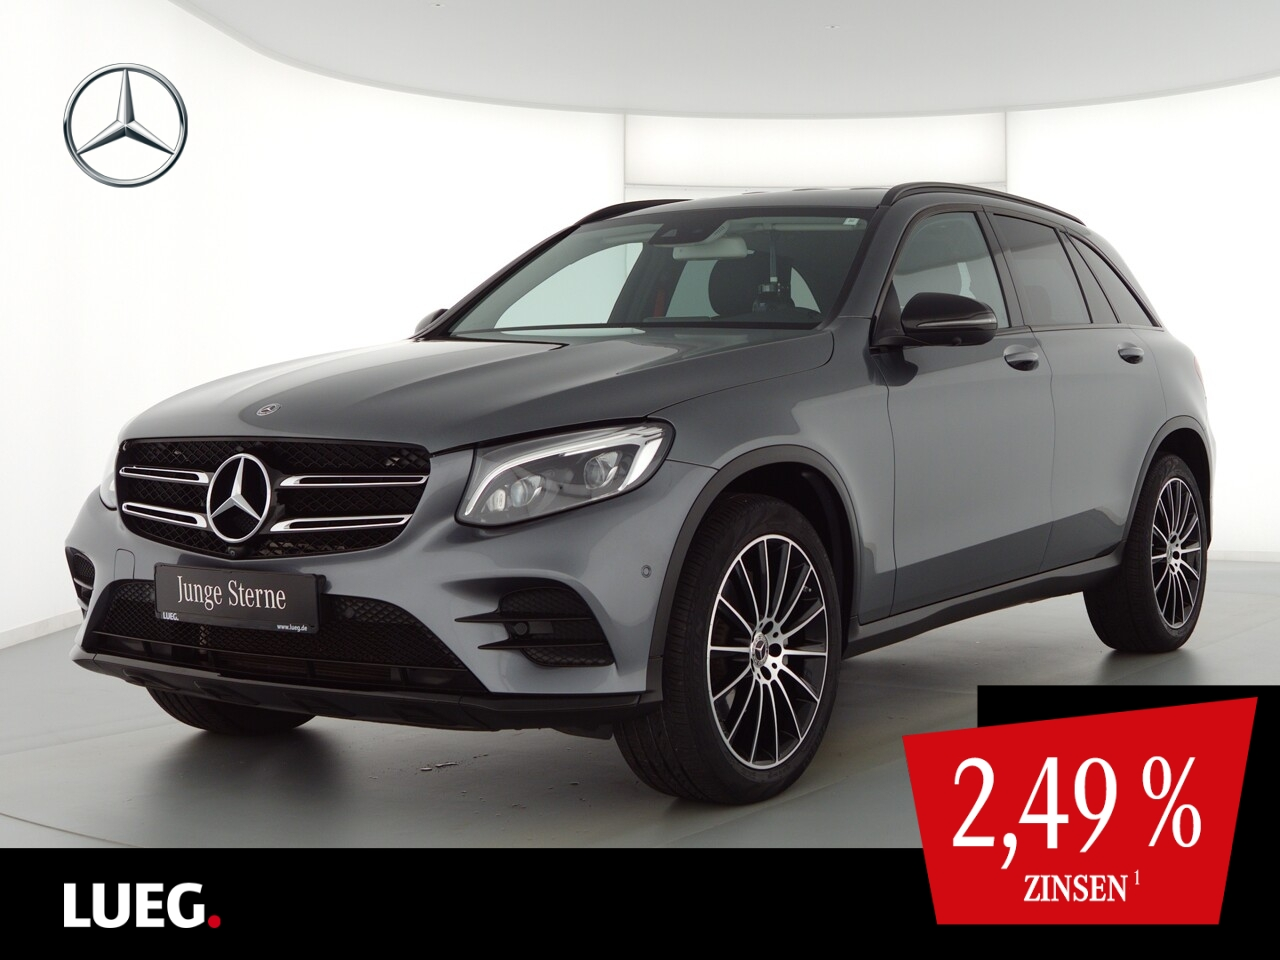 Mercedes-Benz GLC 300 4M AMG+COM+LED-ILS+20+Airm+Sthzg+Mem+360, Jahr 2017, Benzin